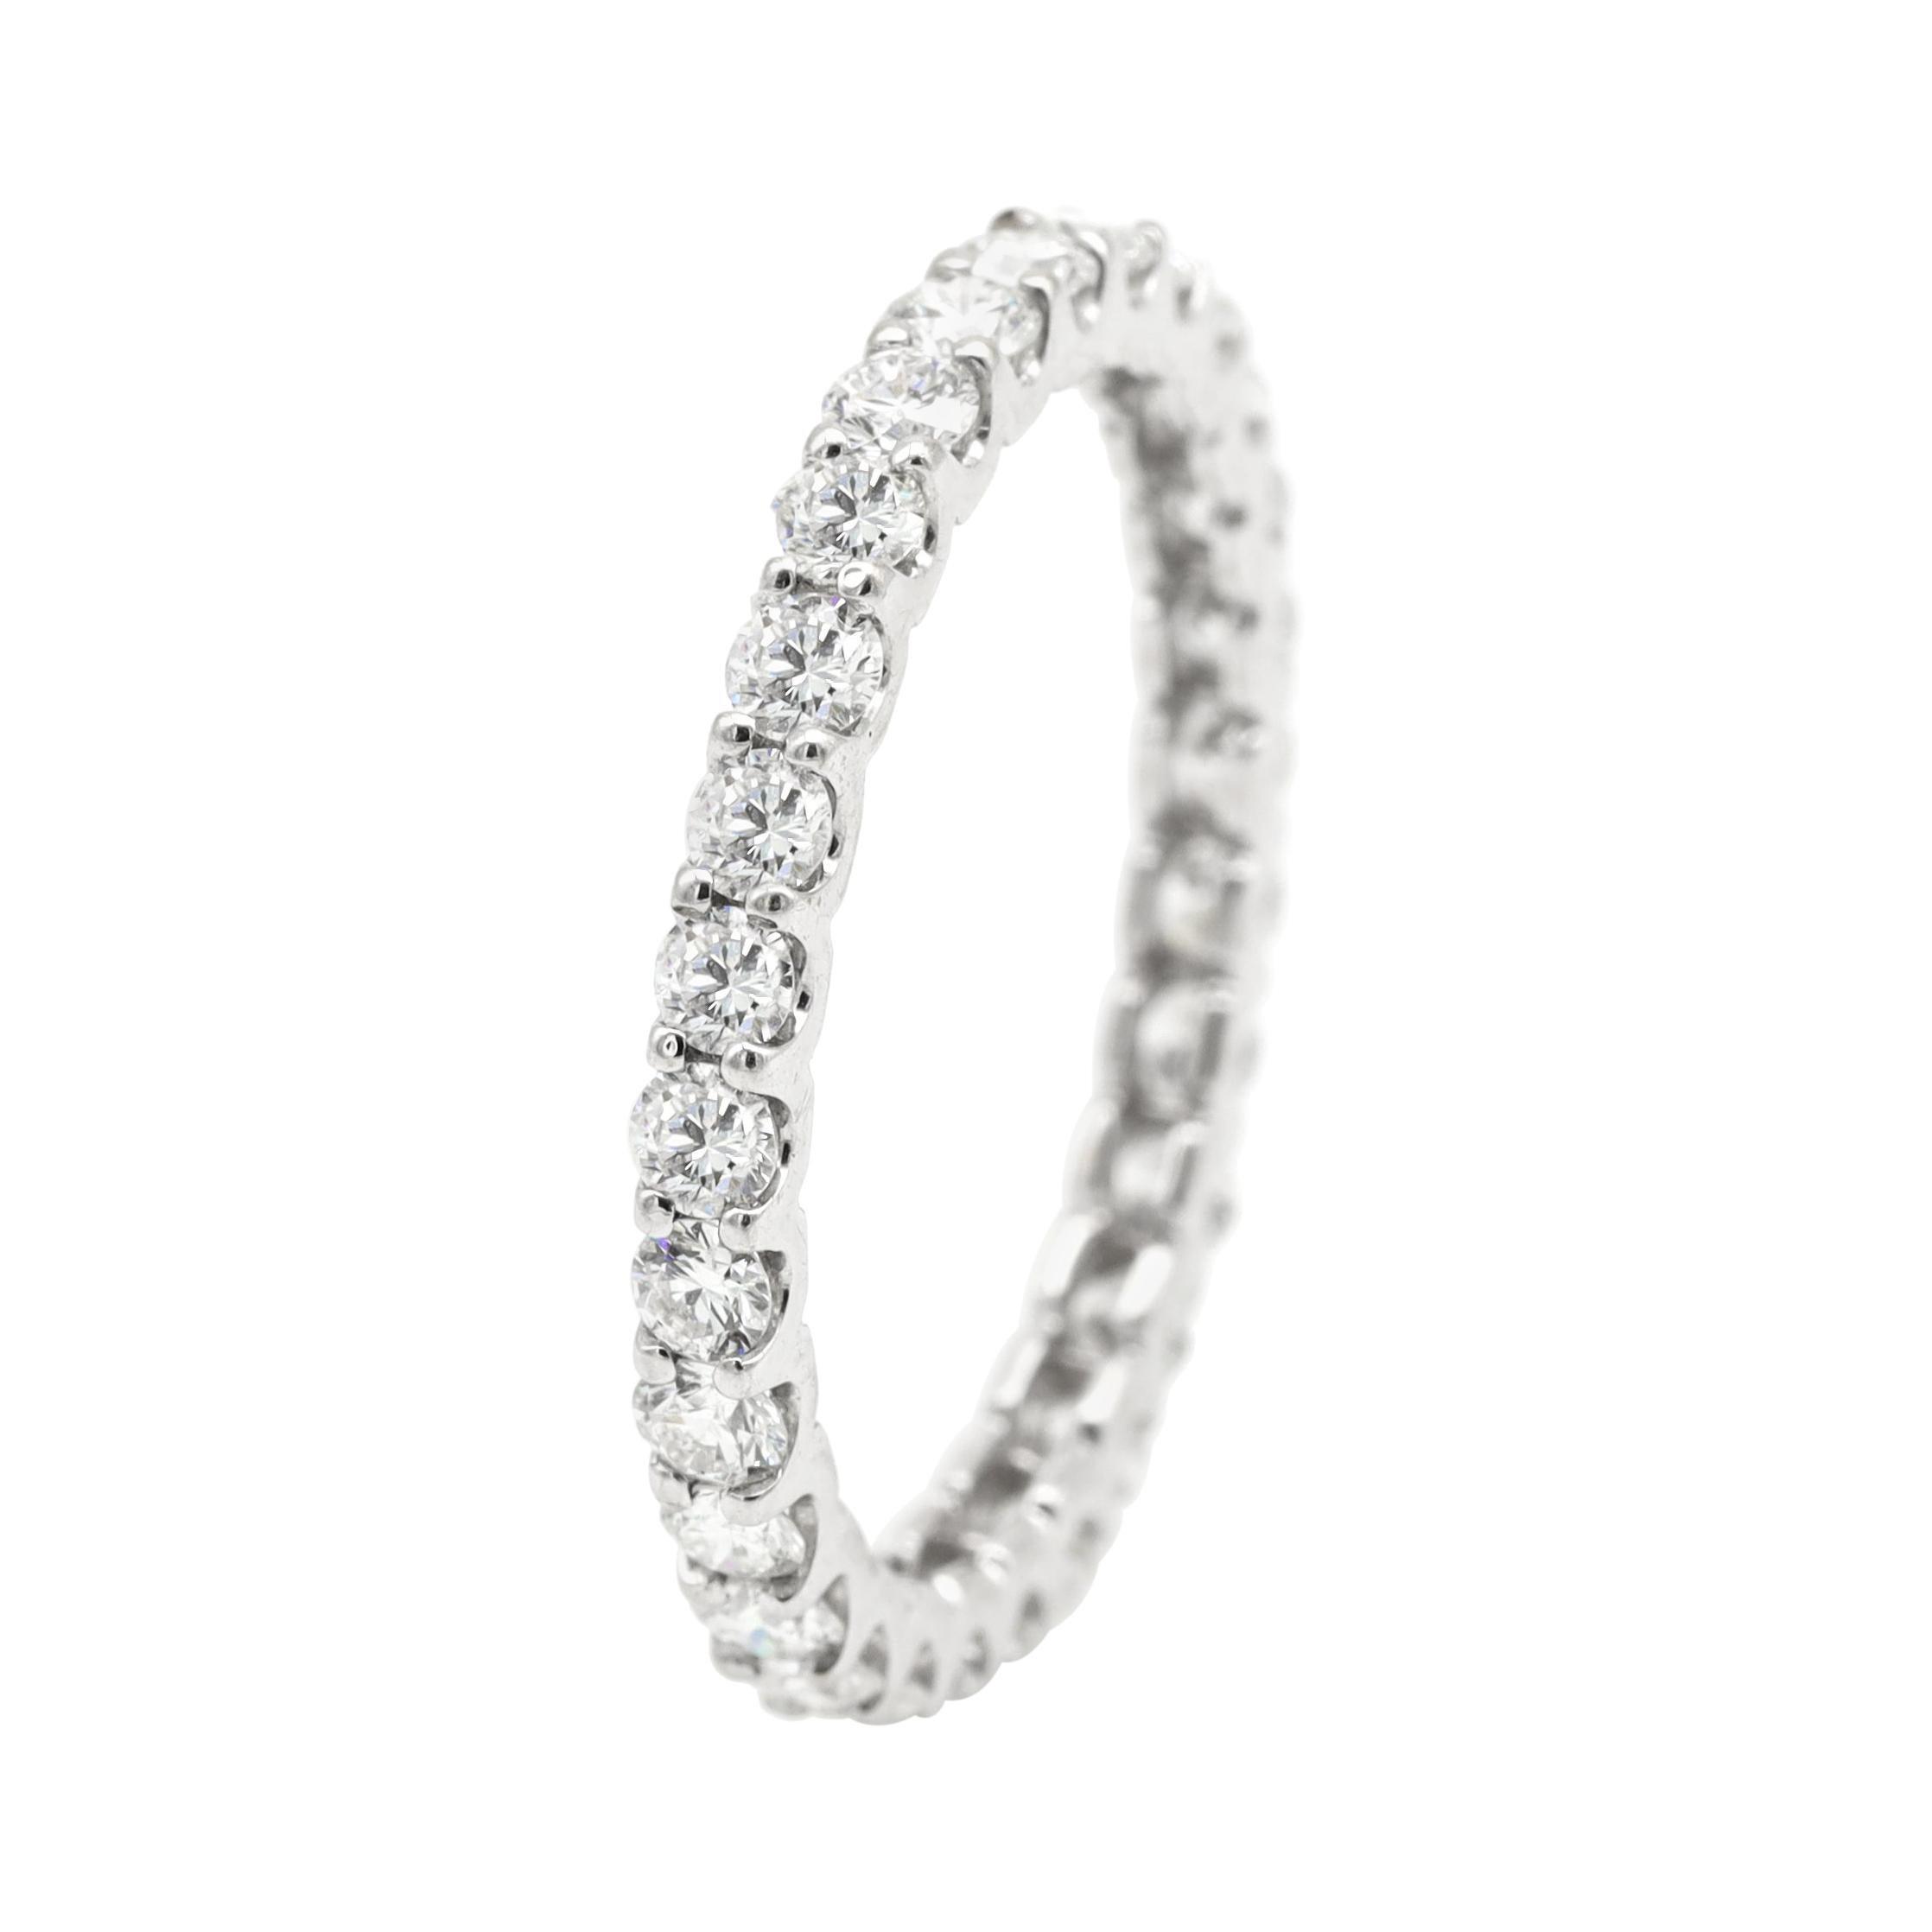 18 Karat White Gold 1.38 Carat Diamond Brilliant-Cut Eternity Full Band Ring